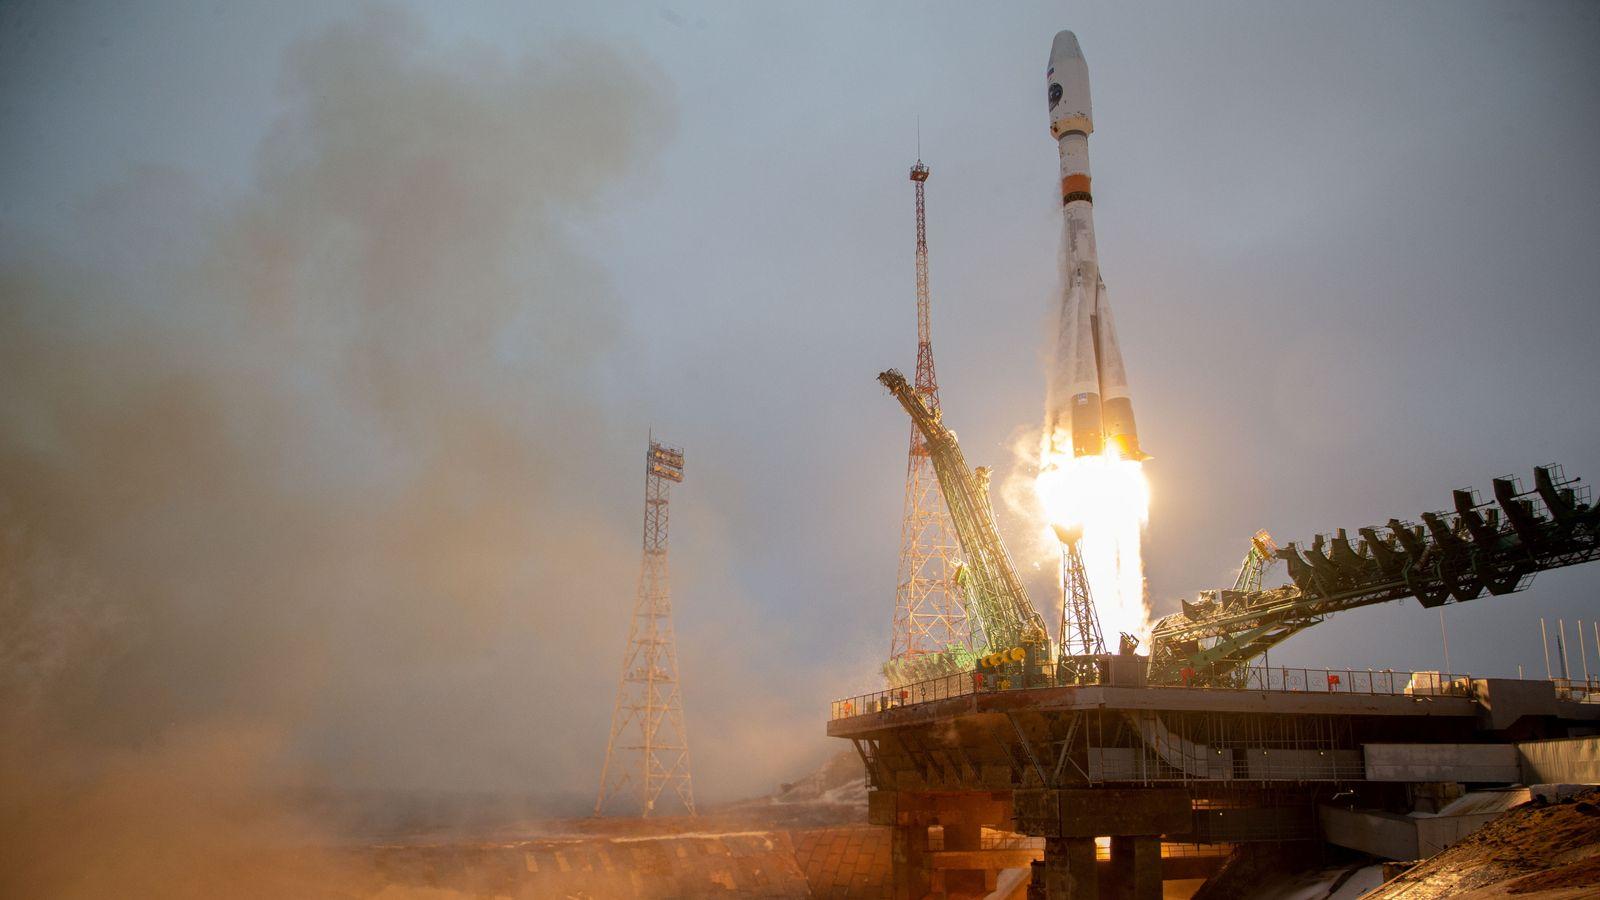 Soyuz 2-1b Fregat M launches Arktika-M 1 arctic meteorological research sat